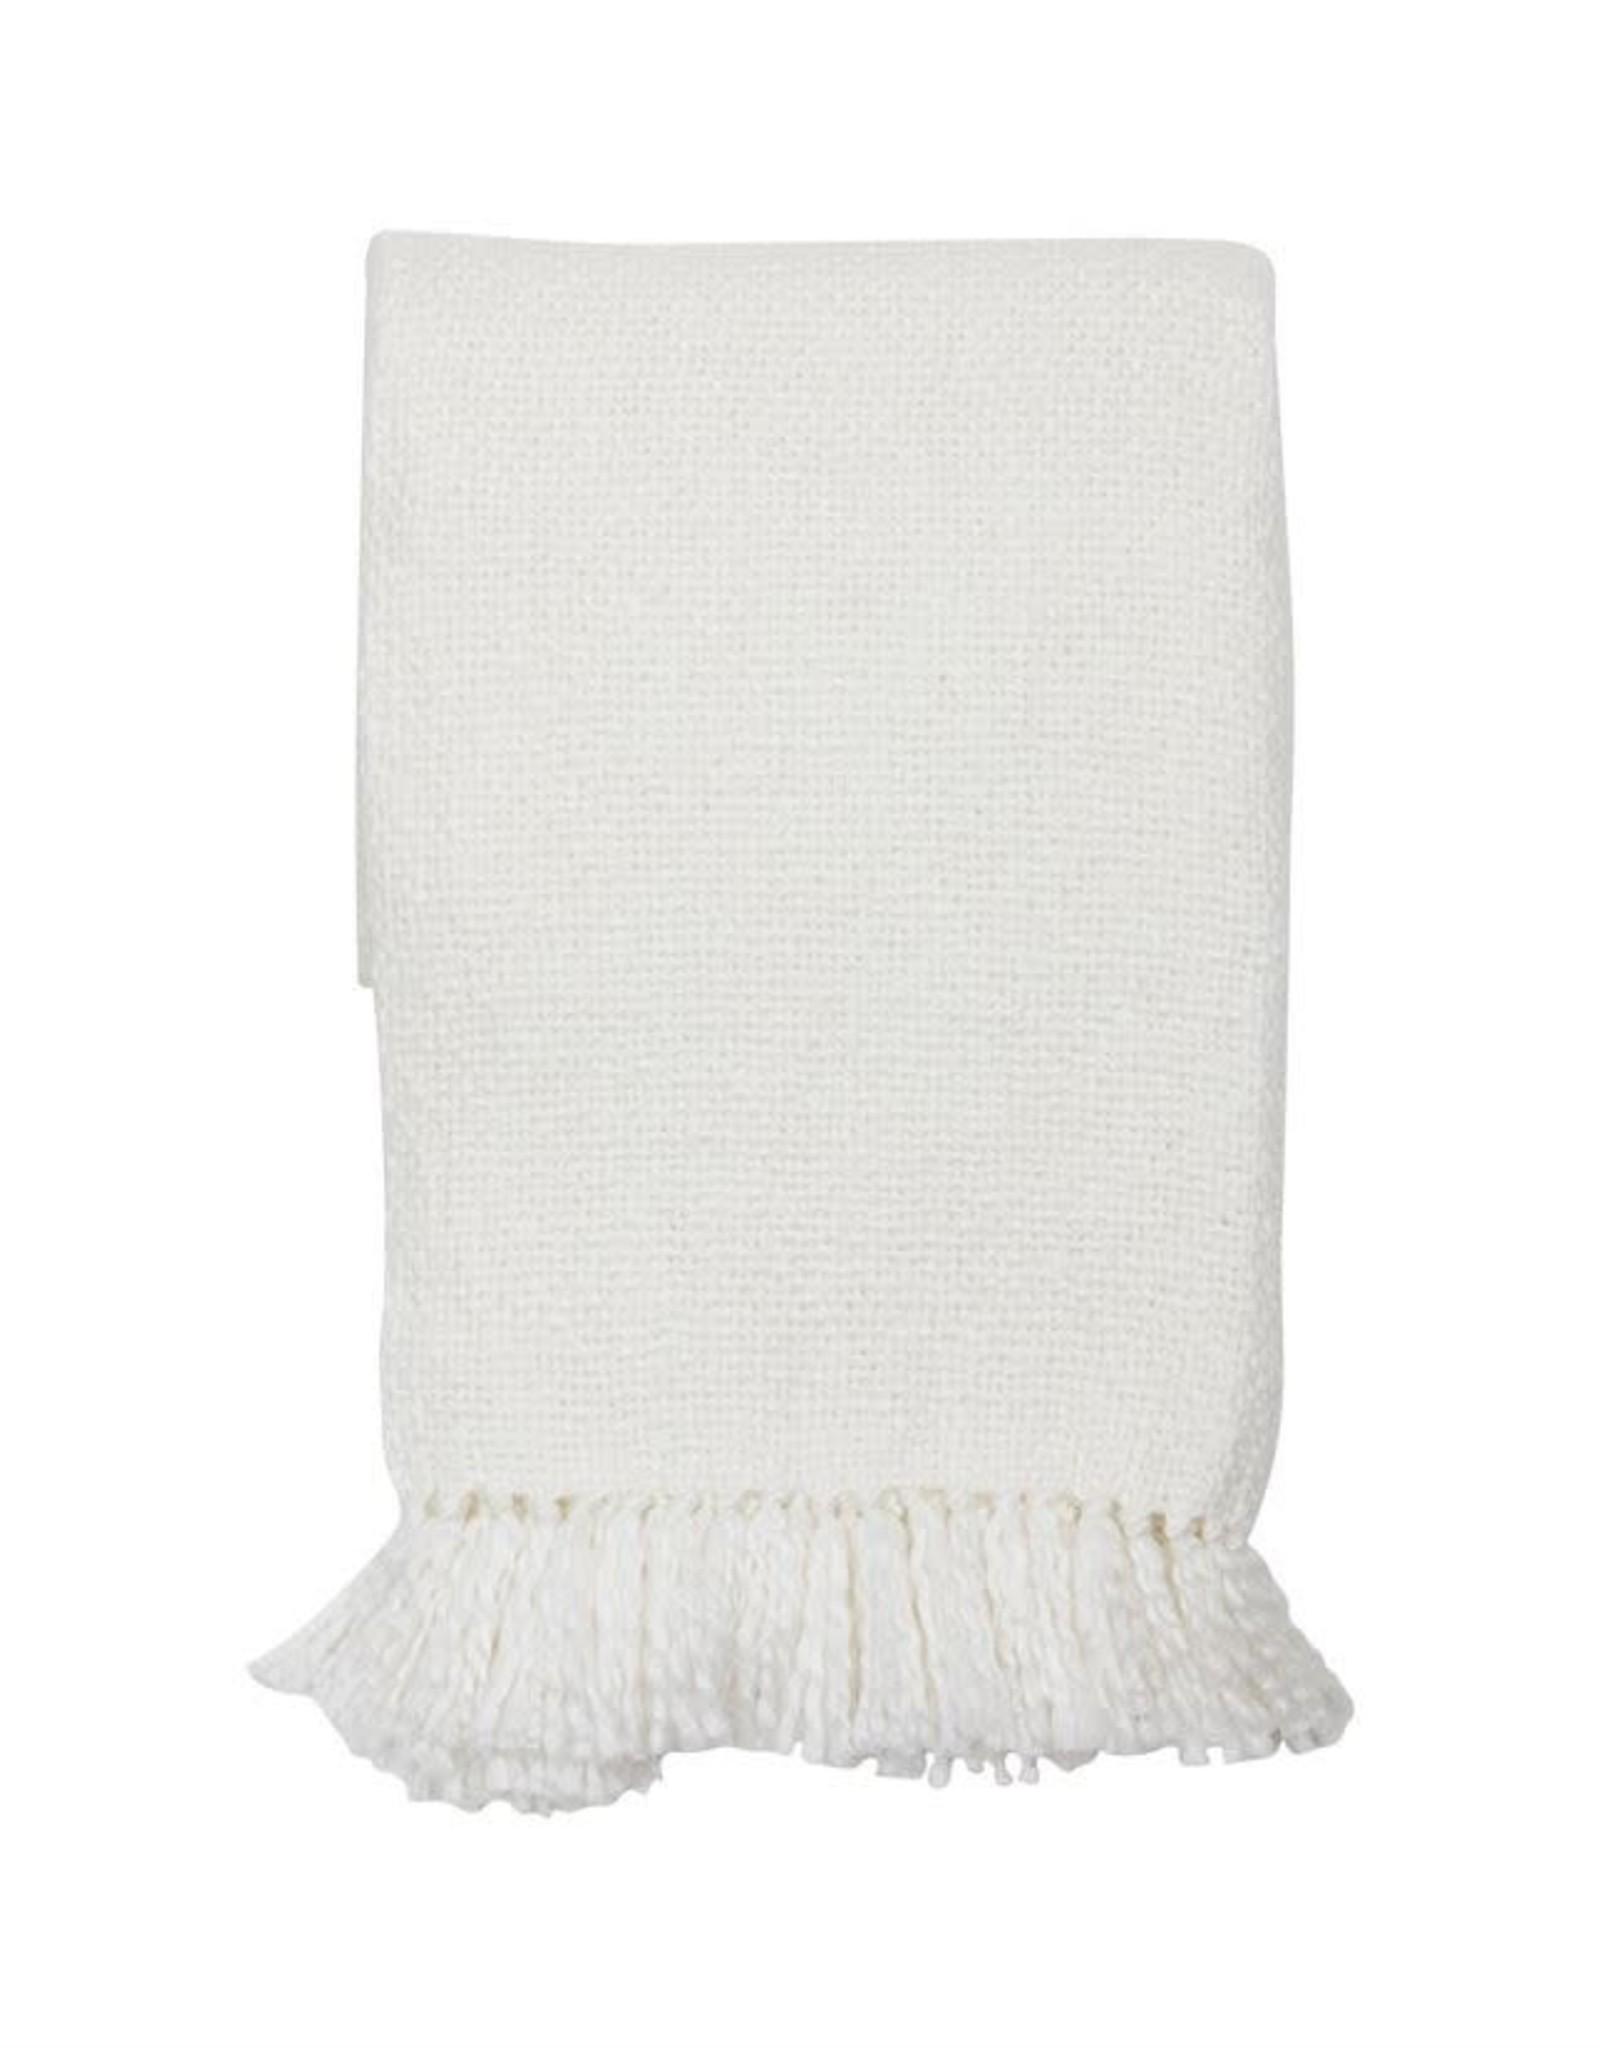 Soft White Throw with Fringe